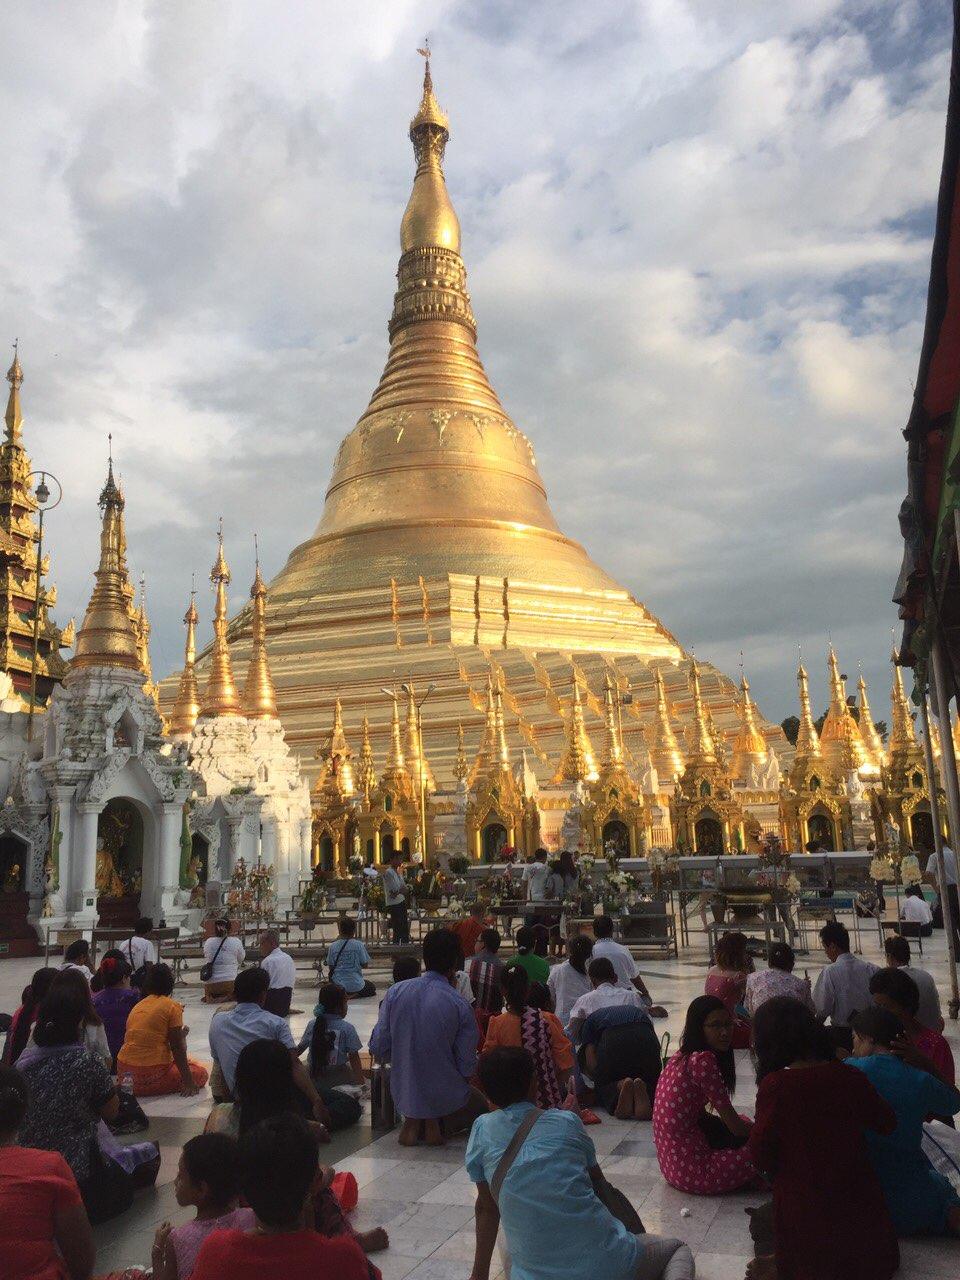 The Shewadagon Pagoda